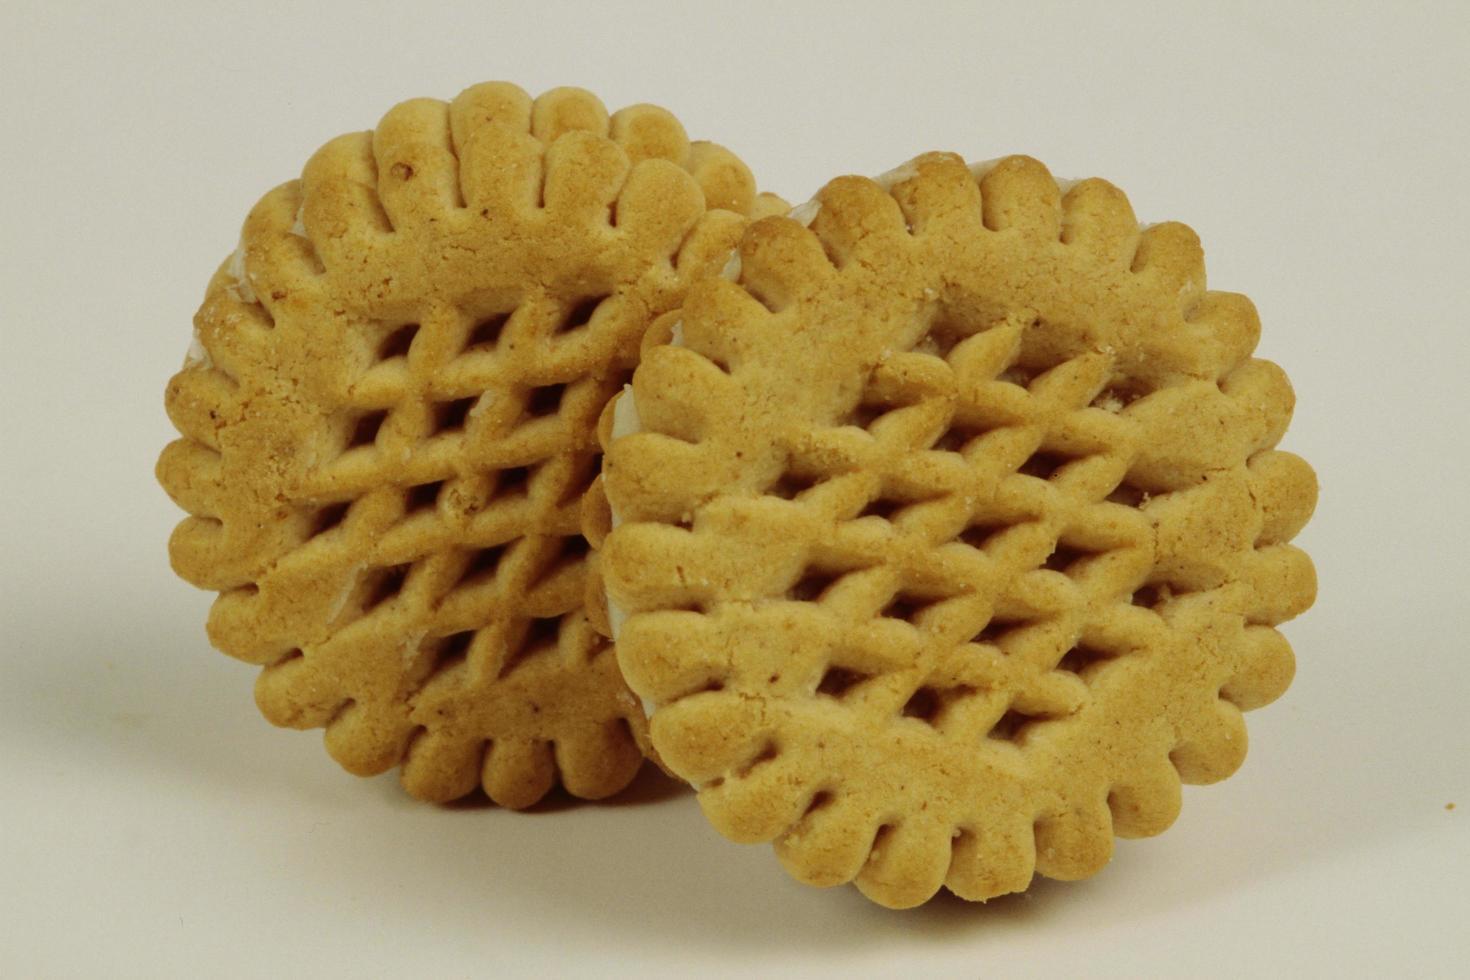 wafer tra i più prodotti da tutte le aziende produttrici di biscotti foto